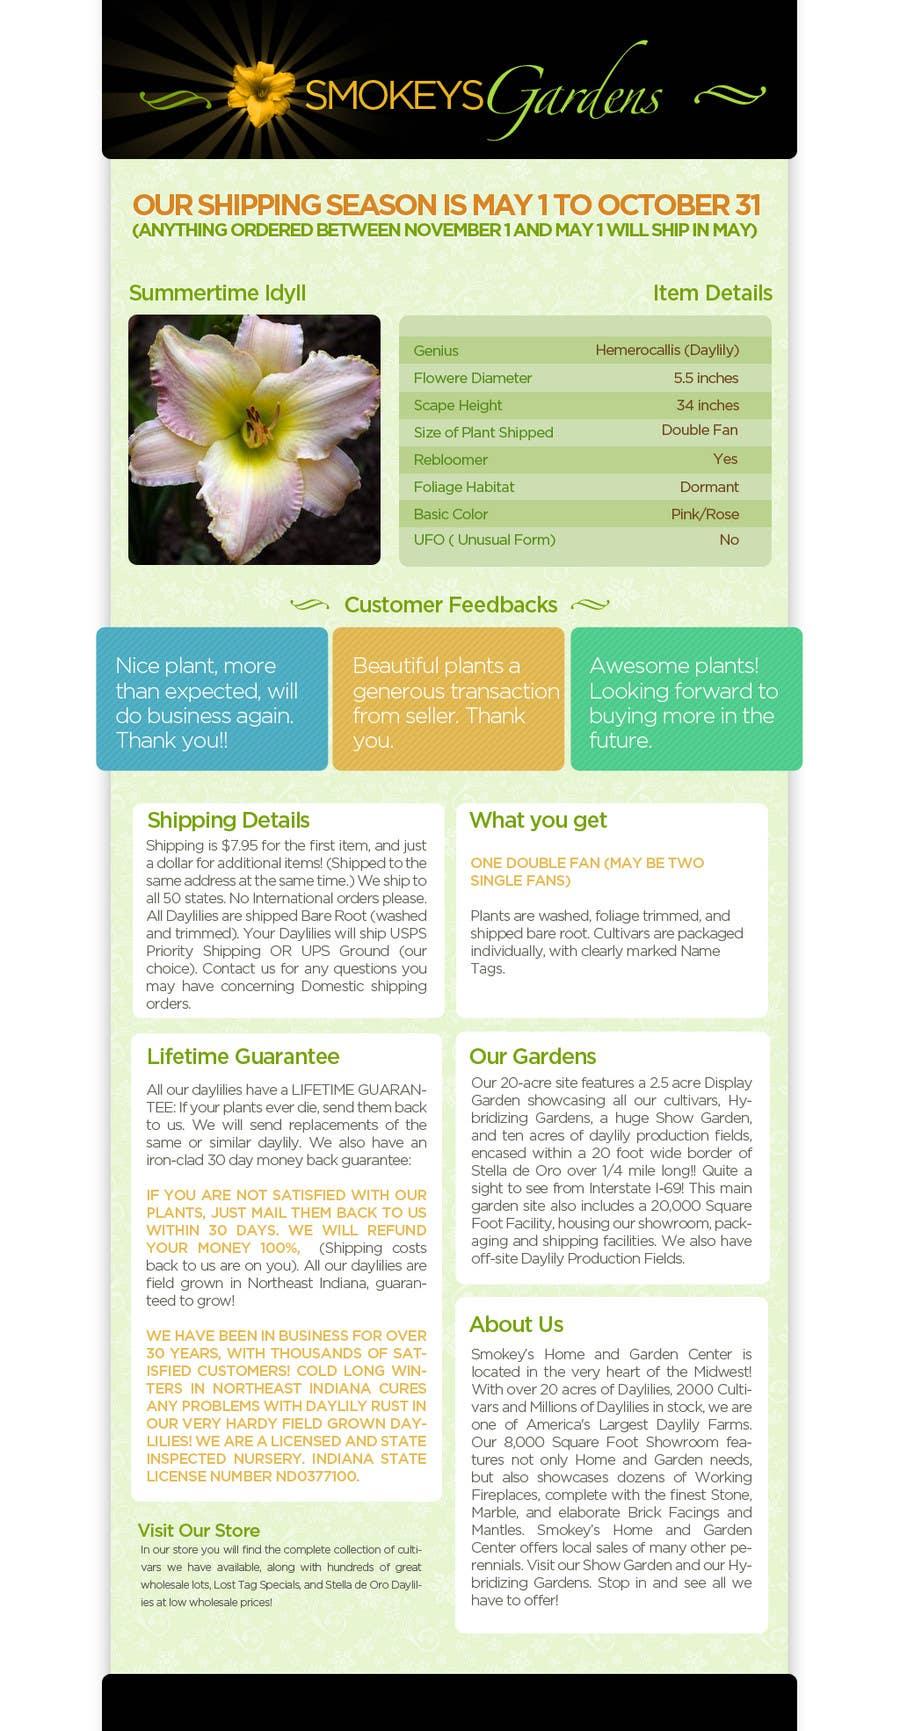 Konkurrenceindlæg #61 for Graphic Design for Smokeys Daylily Gardens